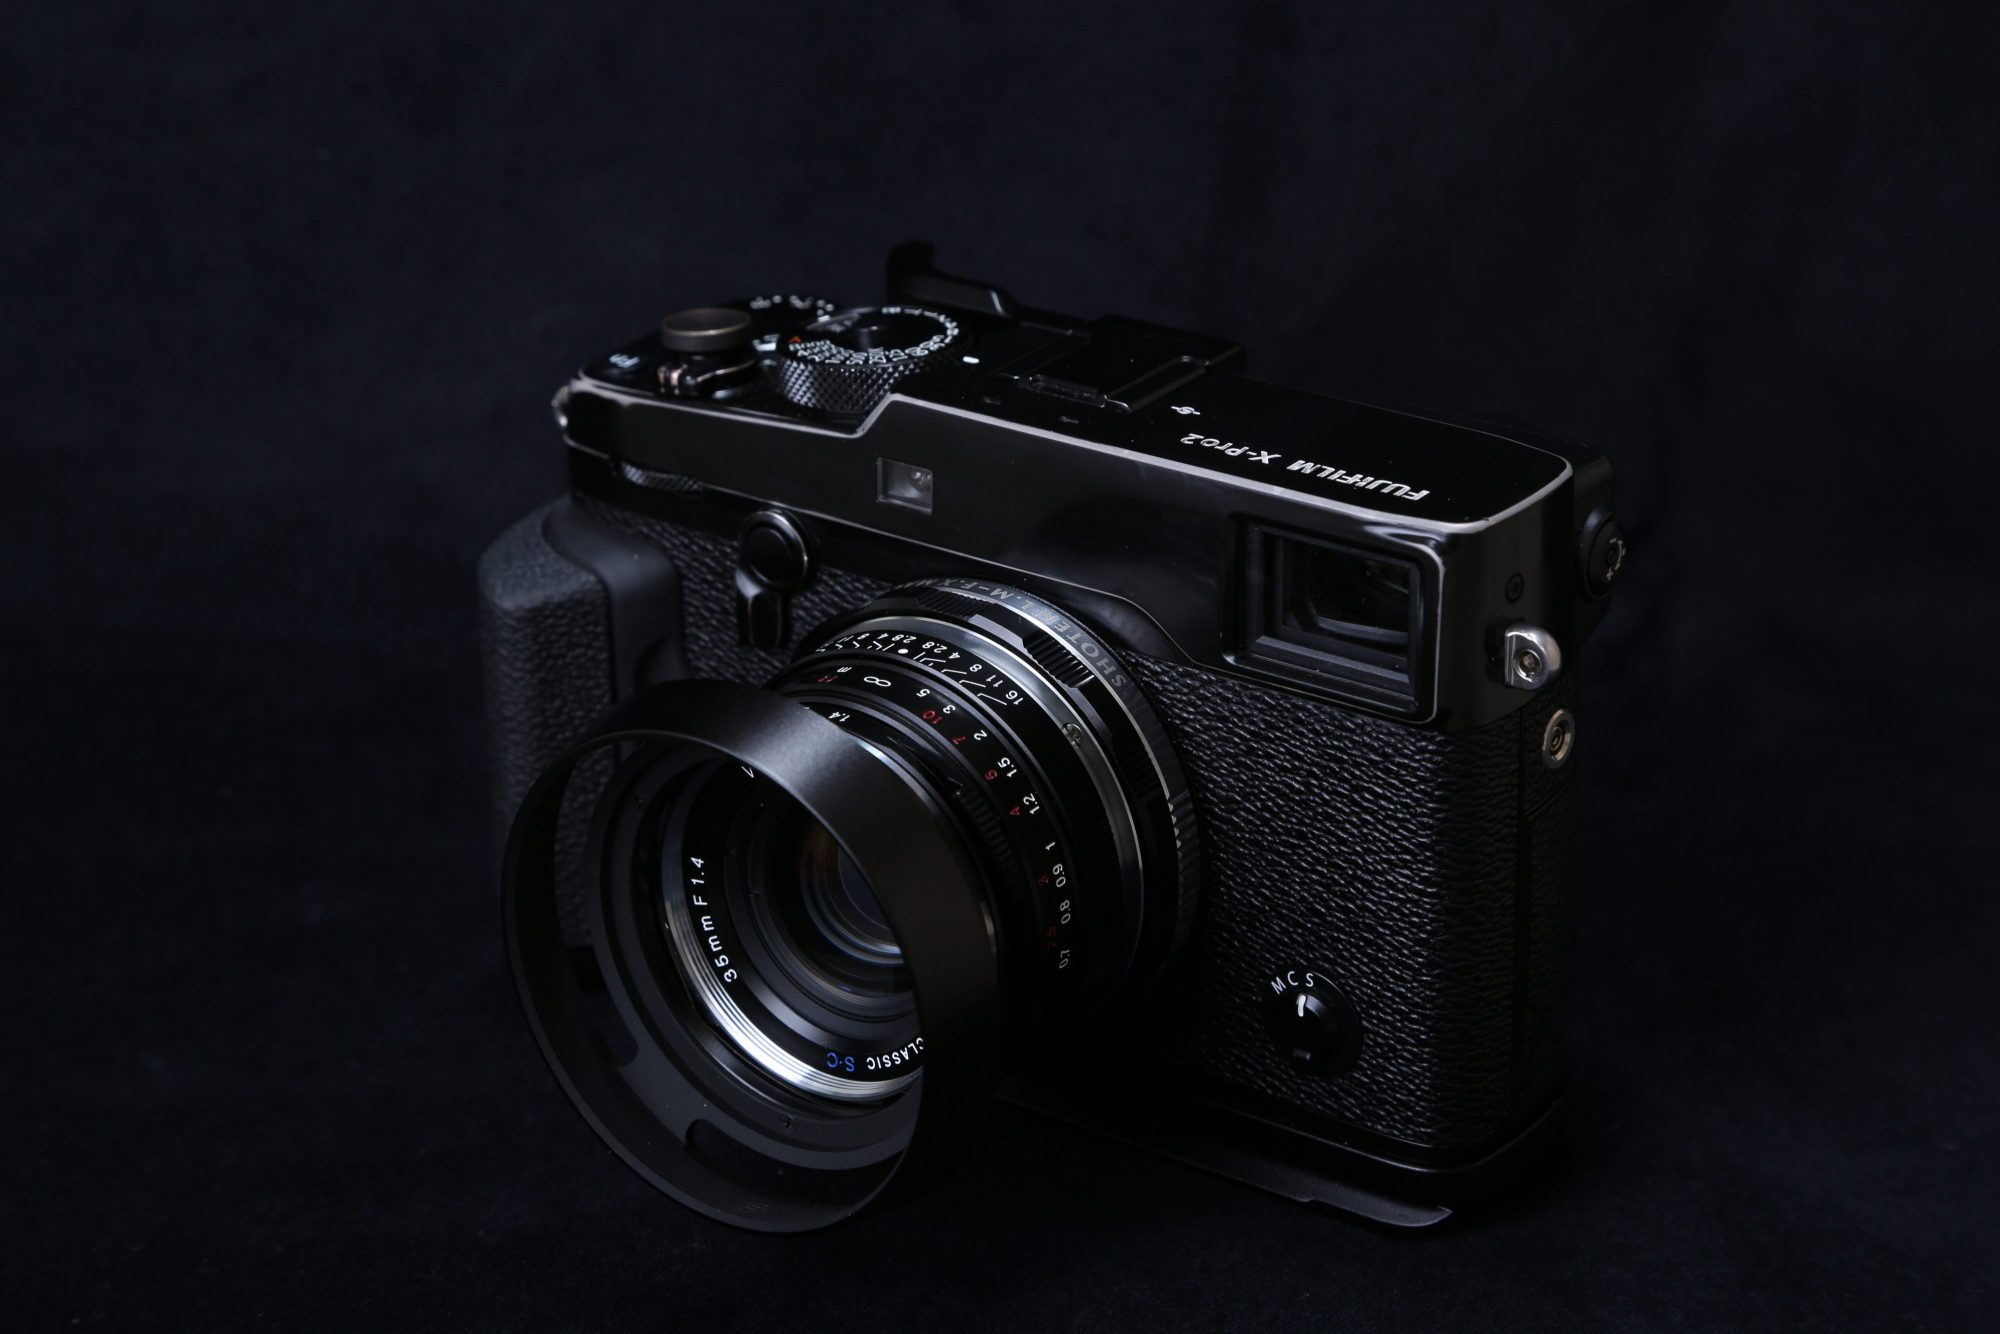 X-Pro2 NOKTON classic 35mm F1.4 S.C